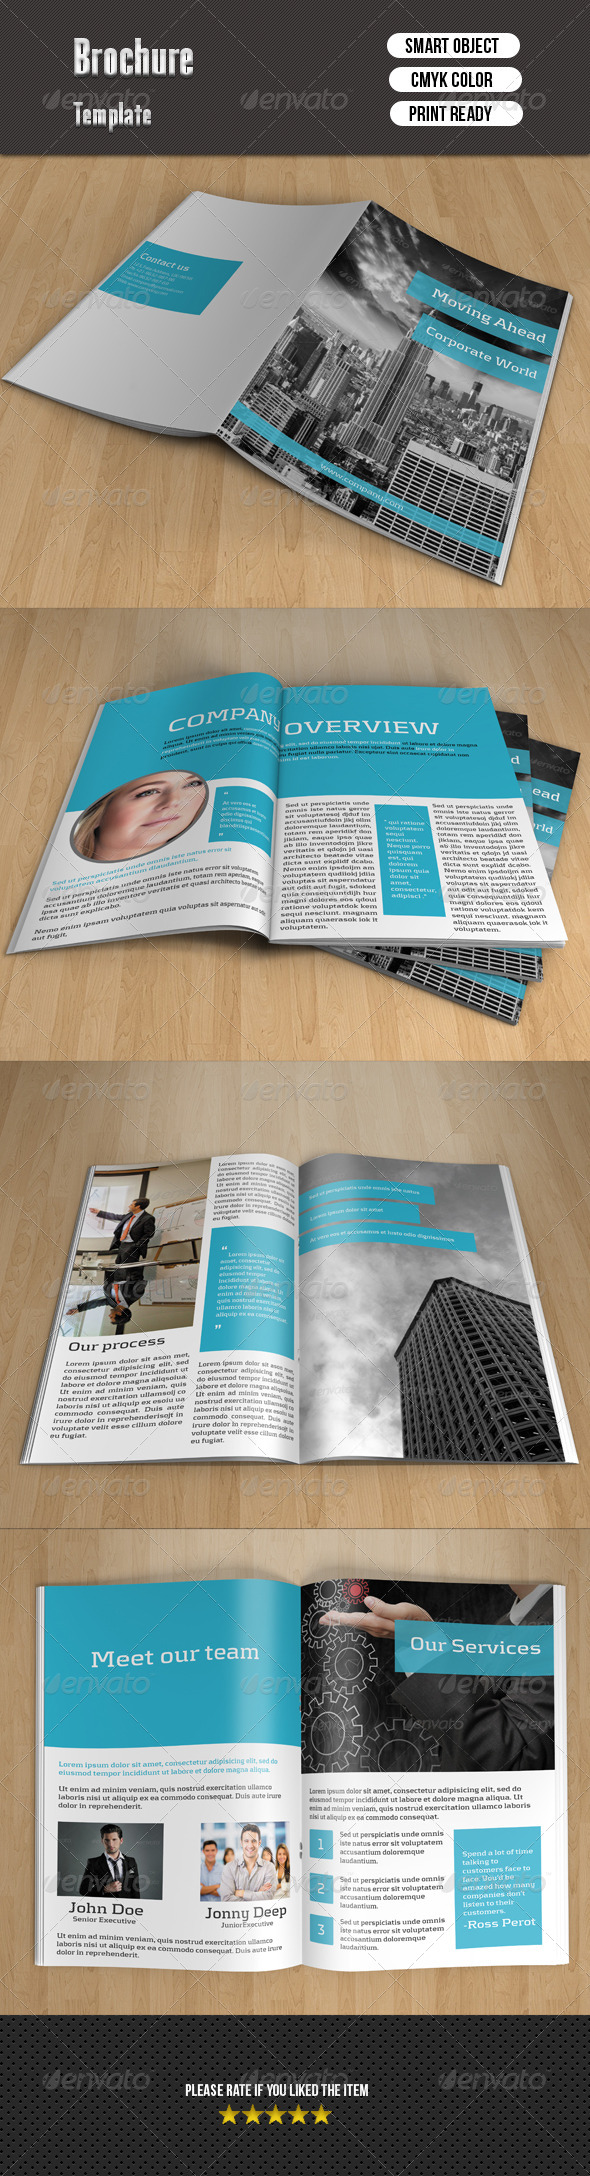 GraphicRiver Corporate Bi-fold Brochure 7949579